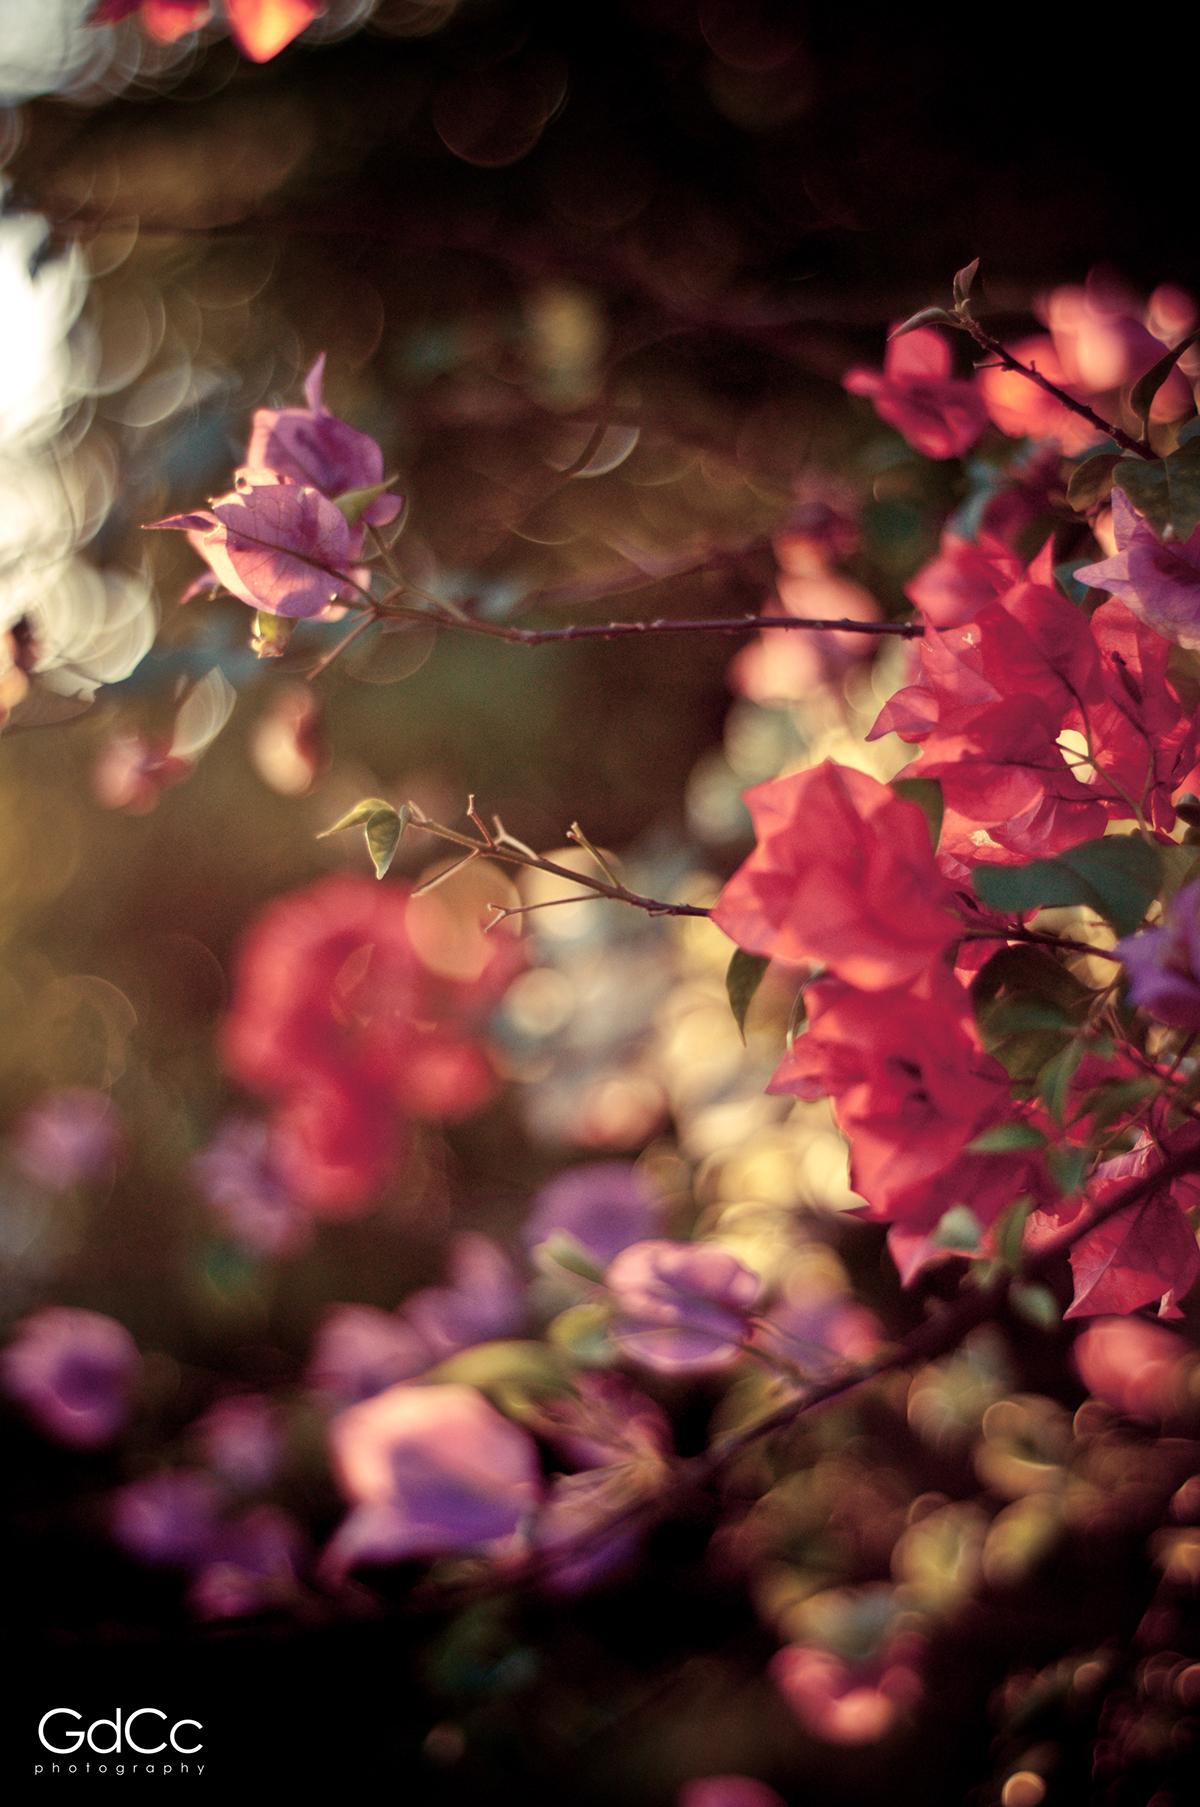 Nature floral photowalk daily life sunset SKY gradient sea summer